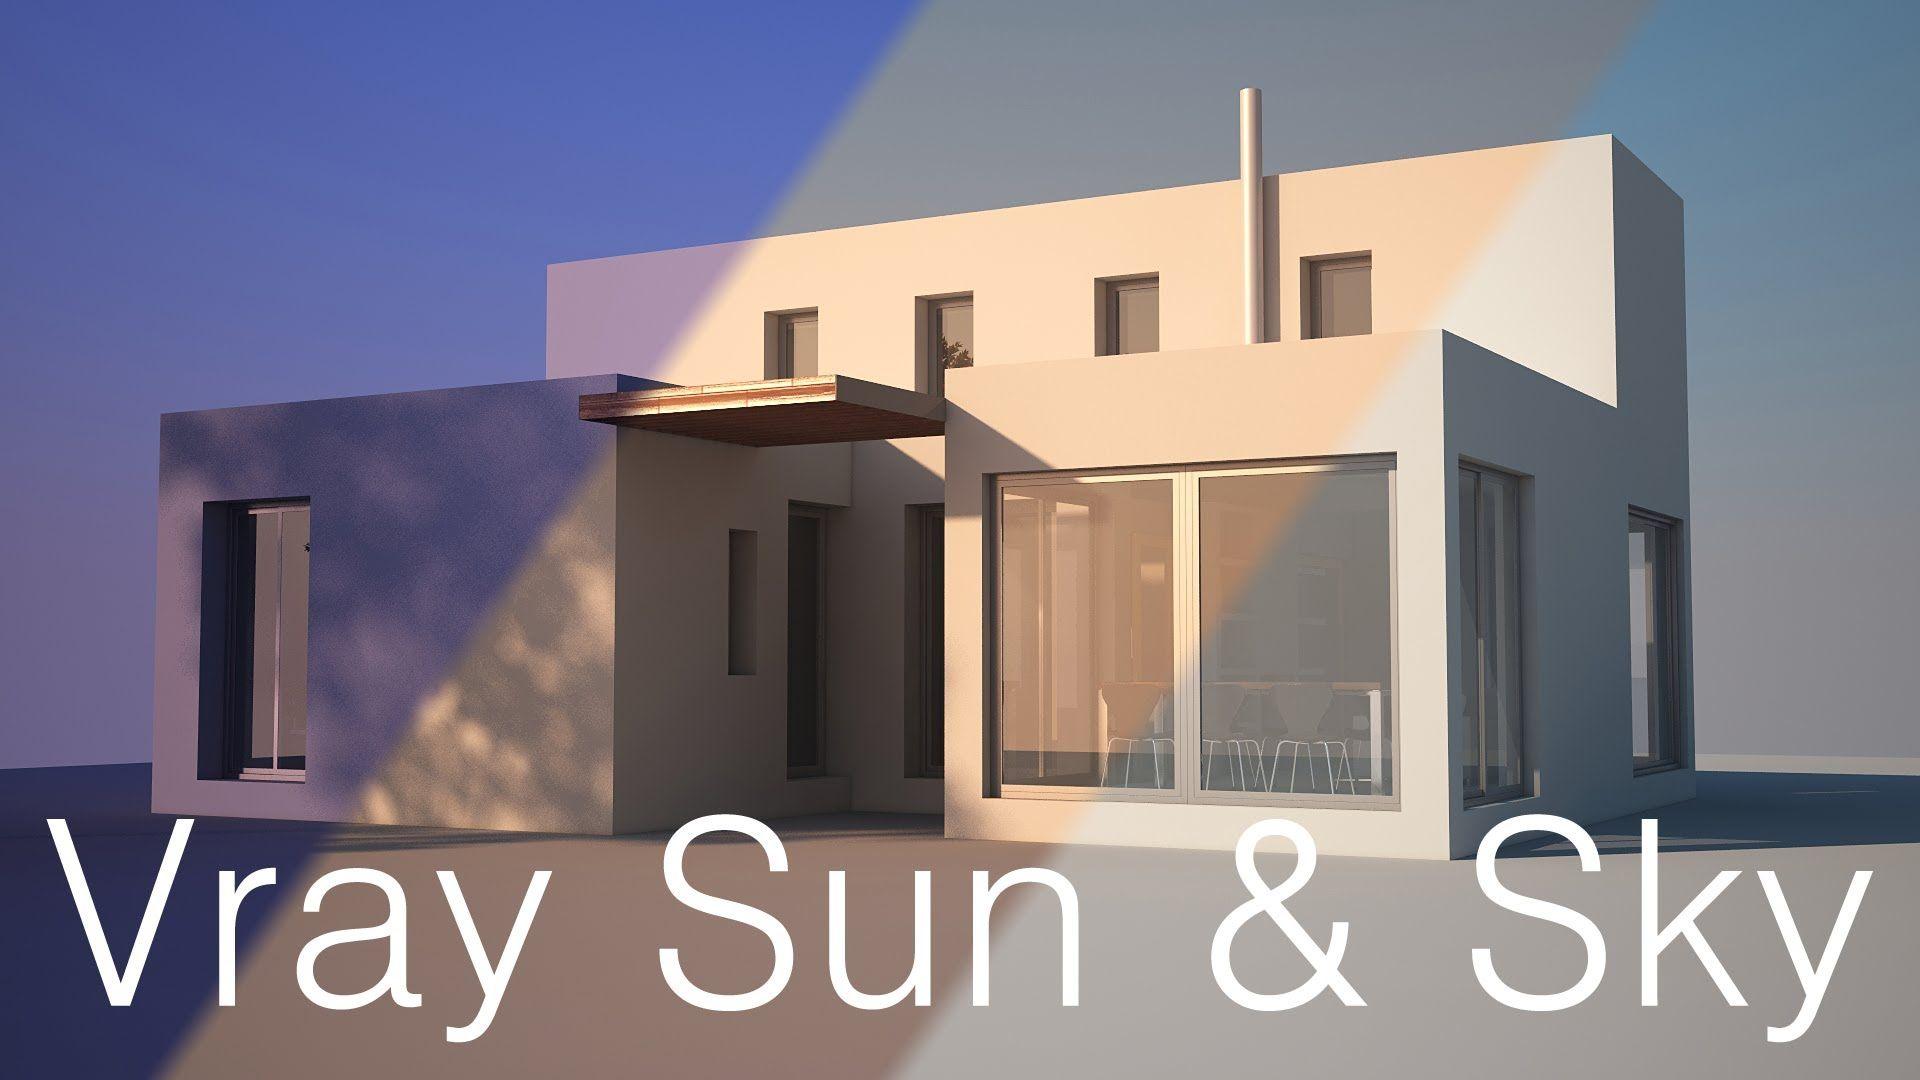 Vray Lighting Tutorial Vray Sun And Sky For Beginners Rendering Pinterest Tutorials 3ds